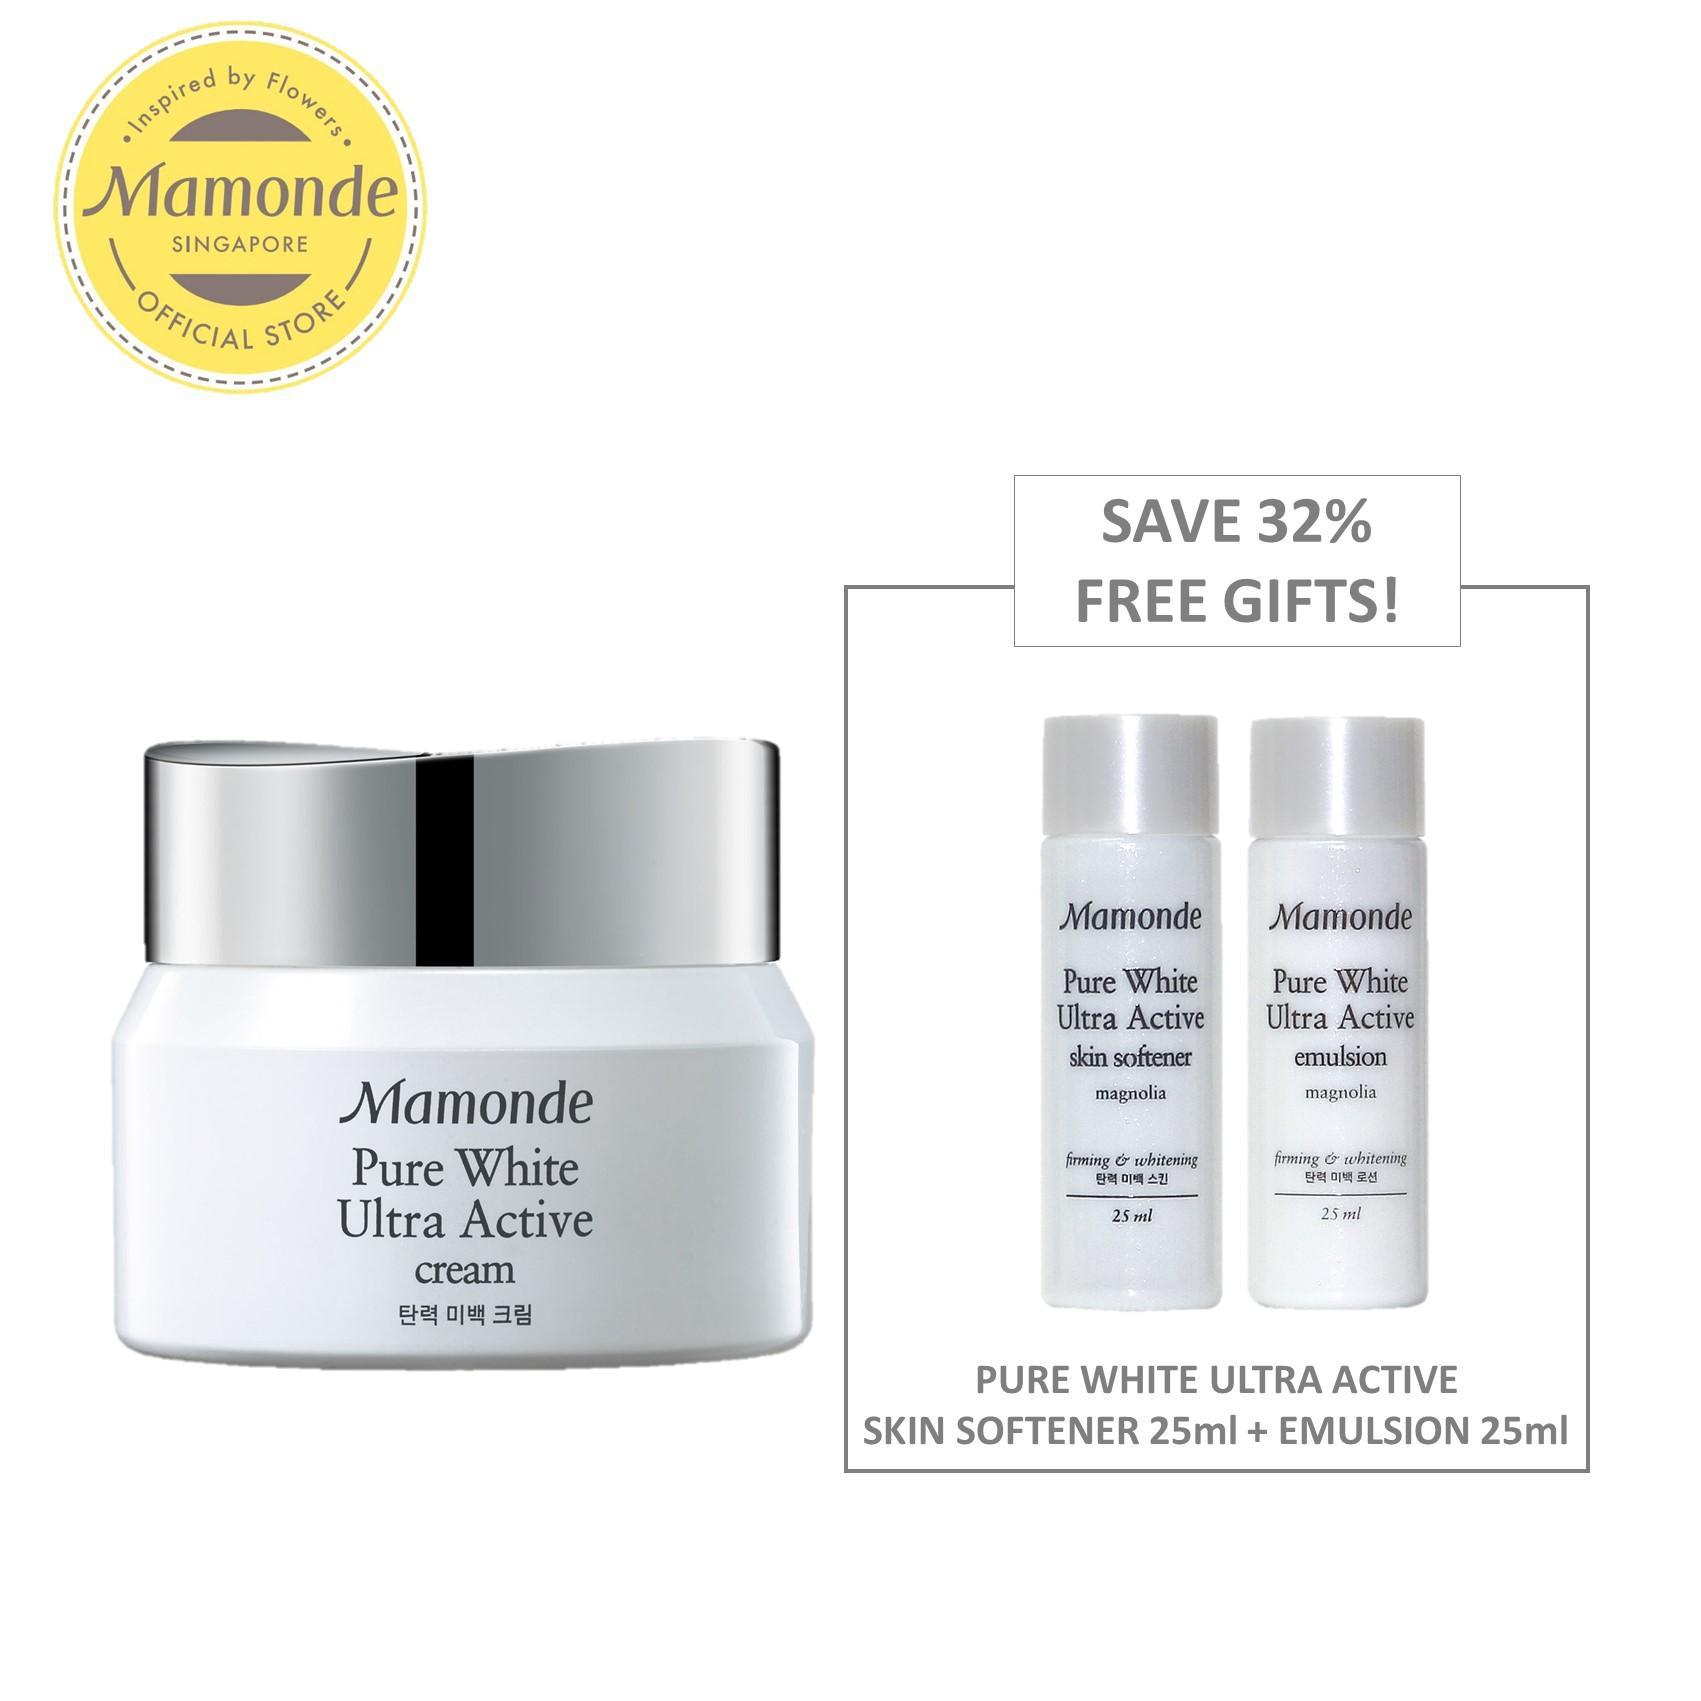 Mamonde Pure White Ultra Active Cream 50Ml Set Exclusive Online